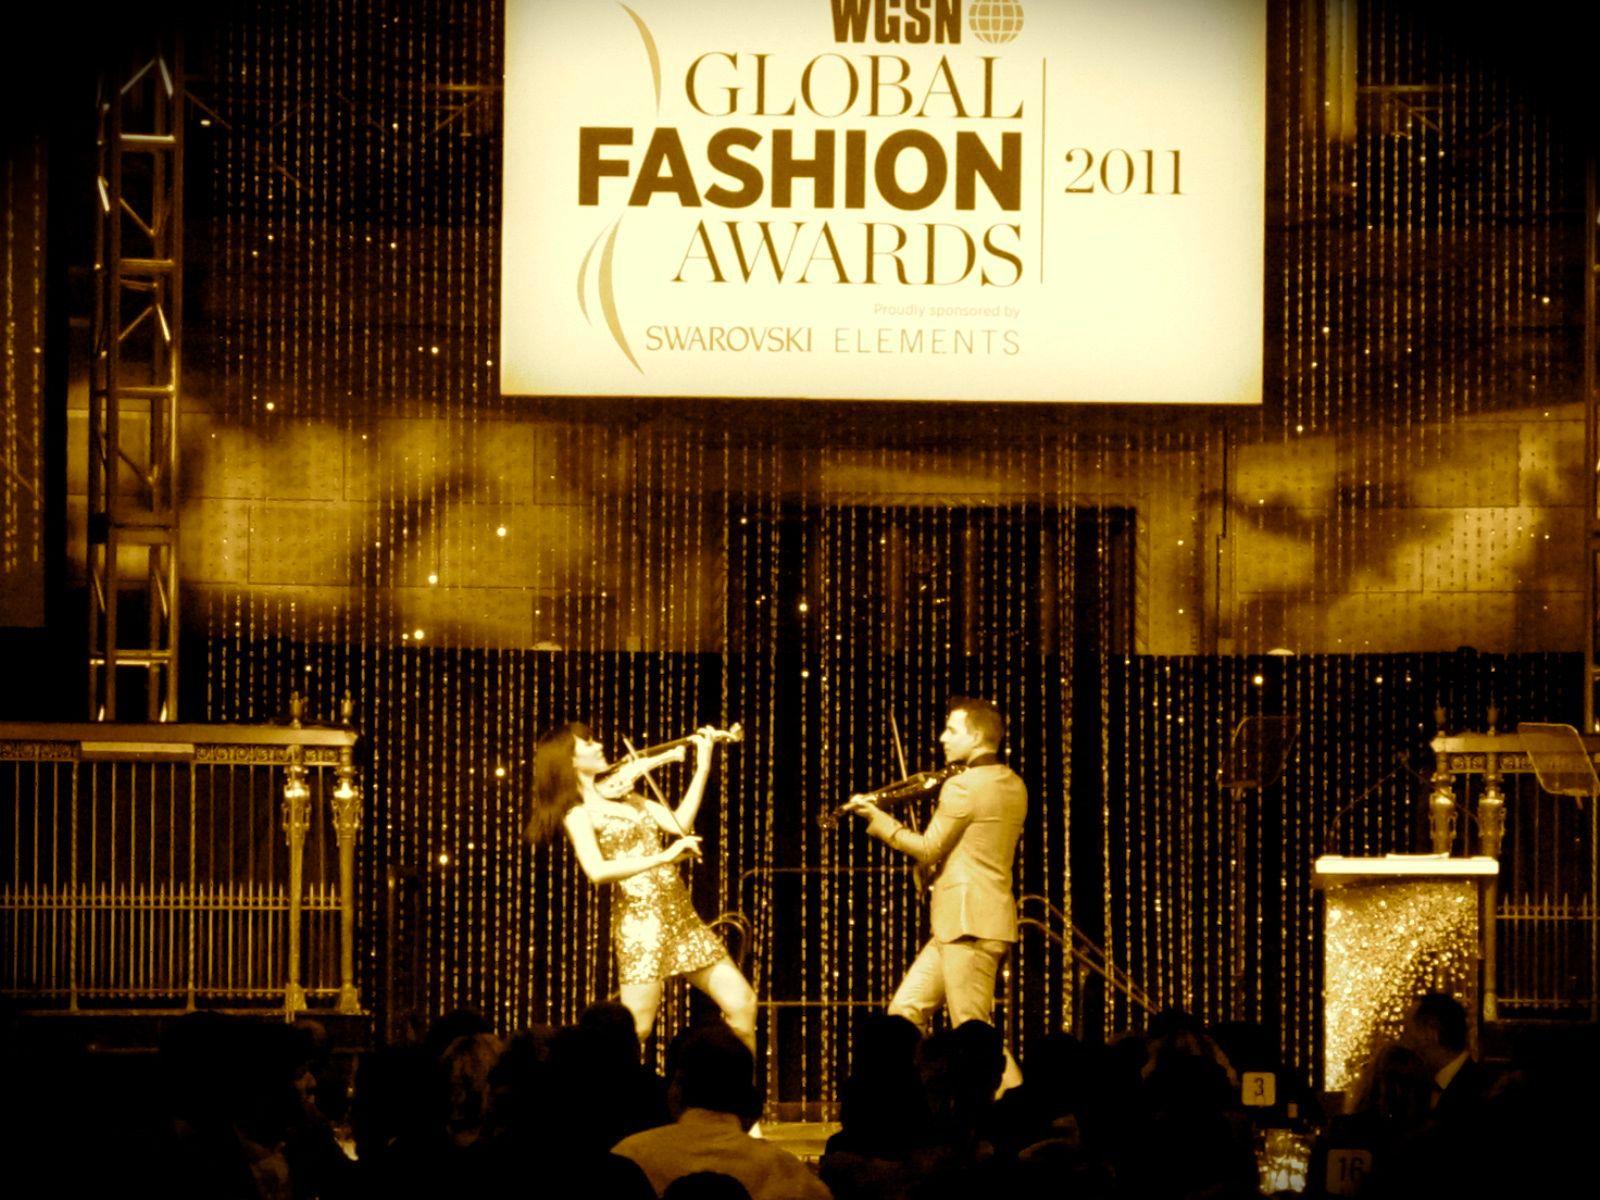 electric violinist fashion awards linzi stoppard